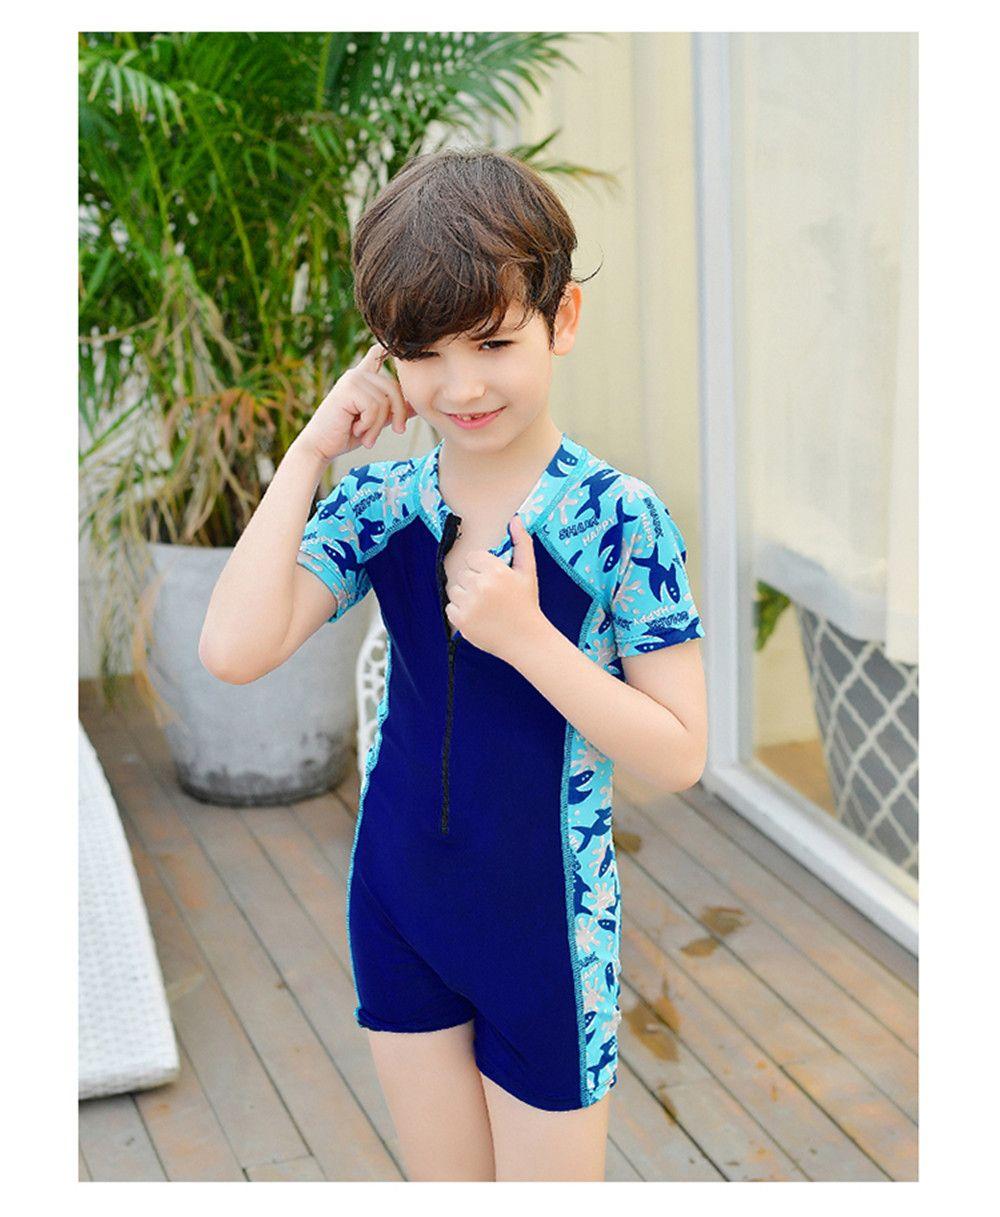 2ee6f7315c7 Child Swimwear One Piece Boys Swimsuits Cartoon Print Kids Bathing Suits  Baby Boy Swimsuit Children Beach Wear With Back Zipper.